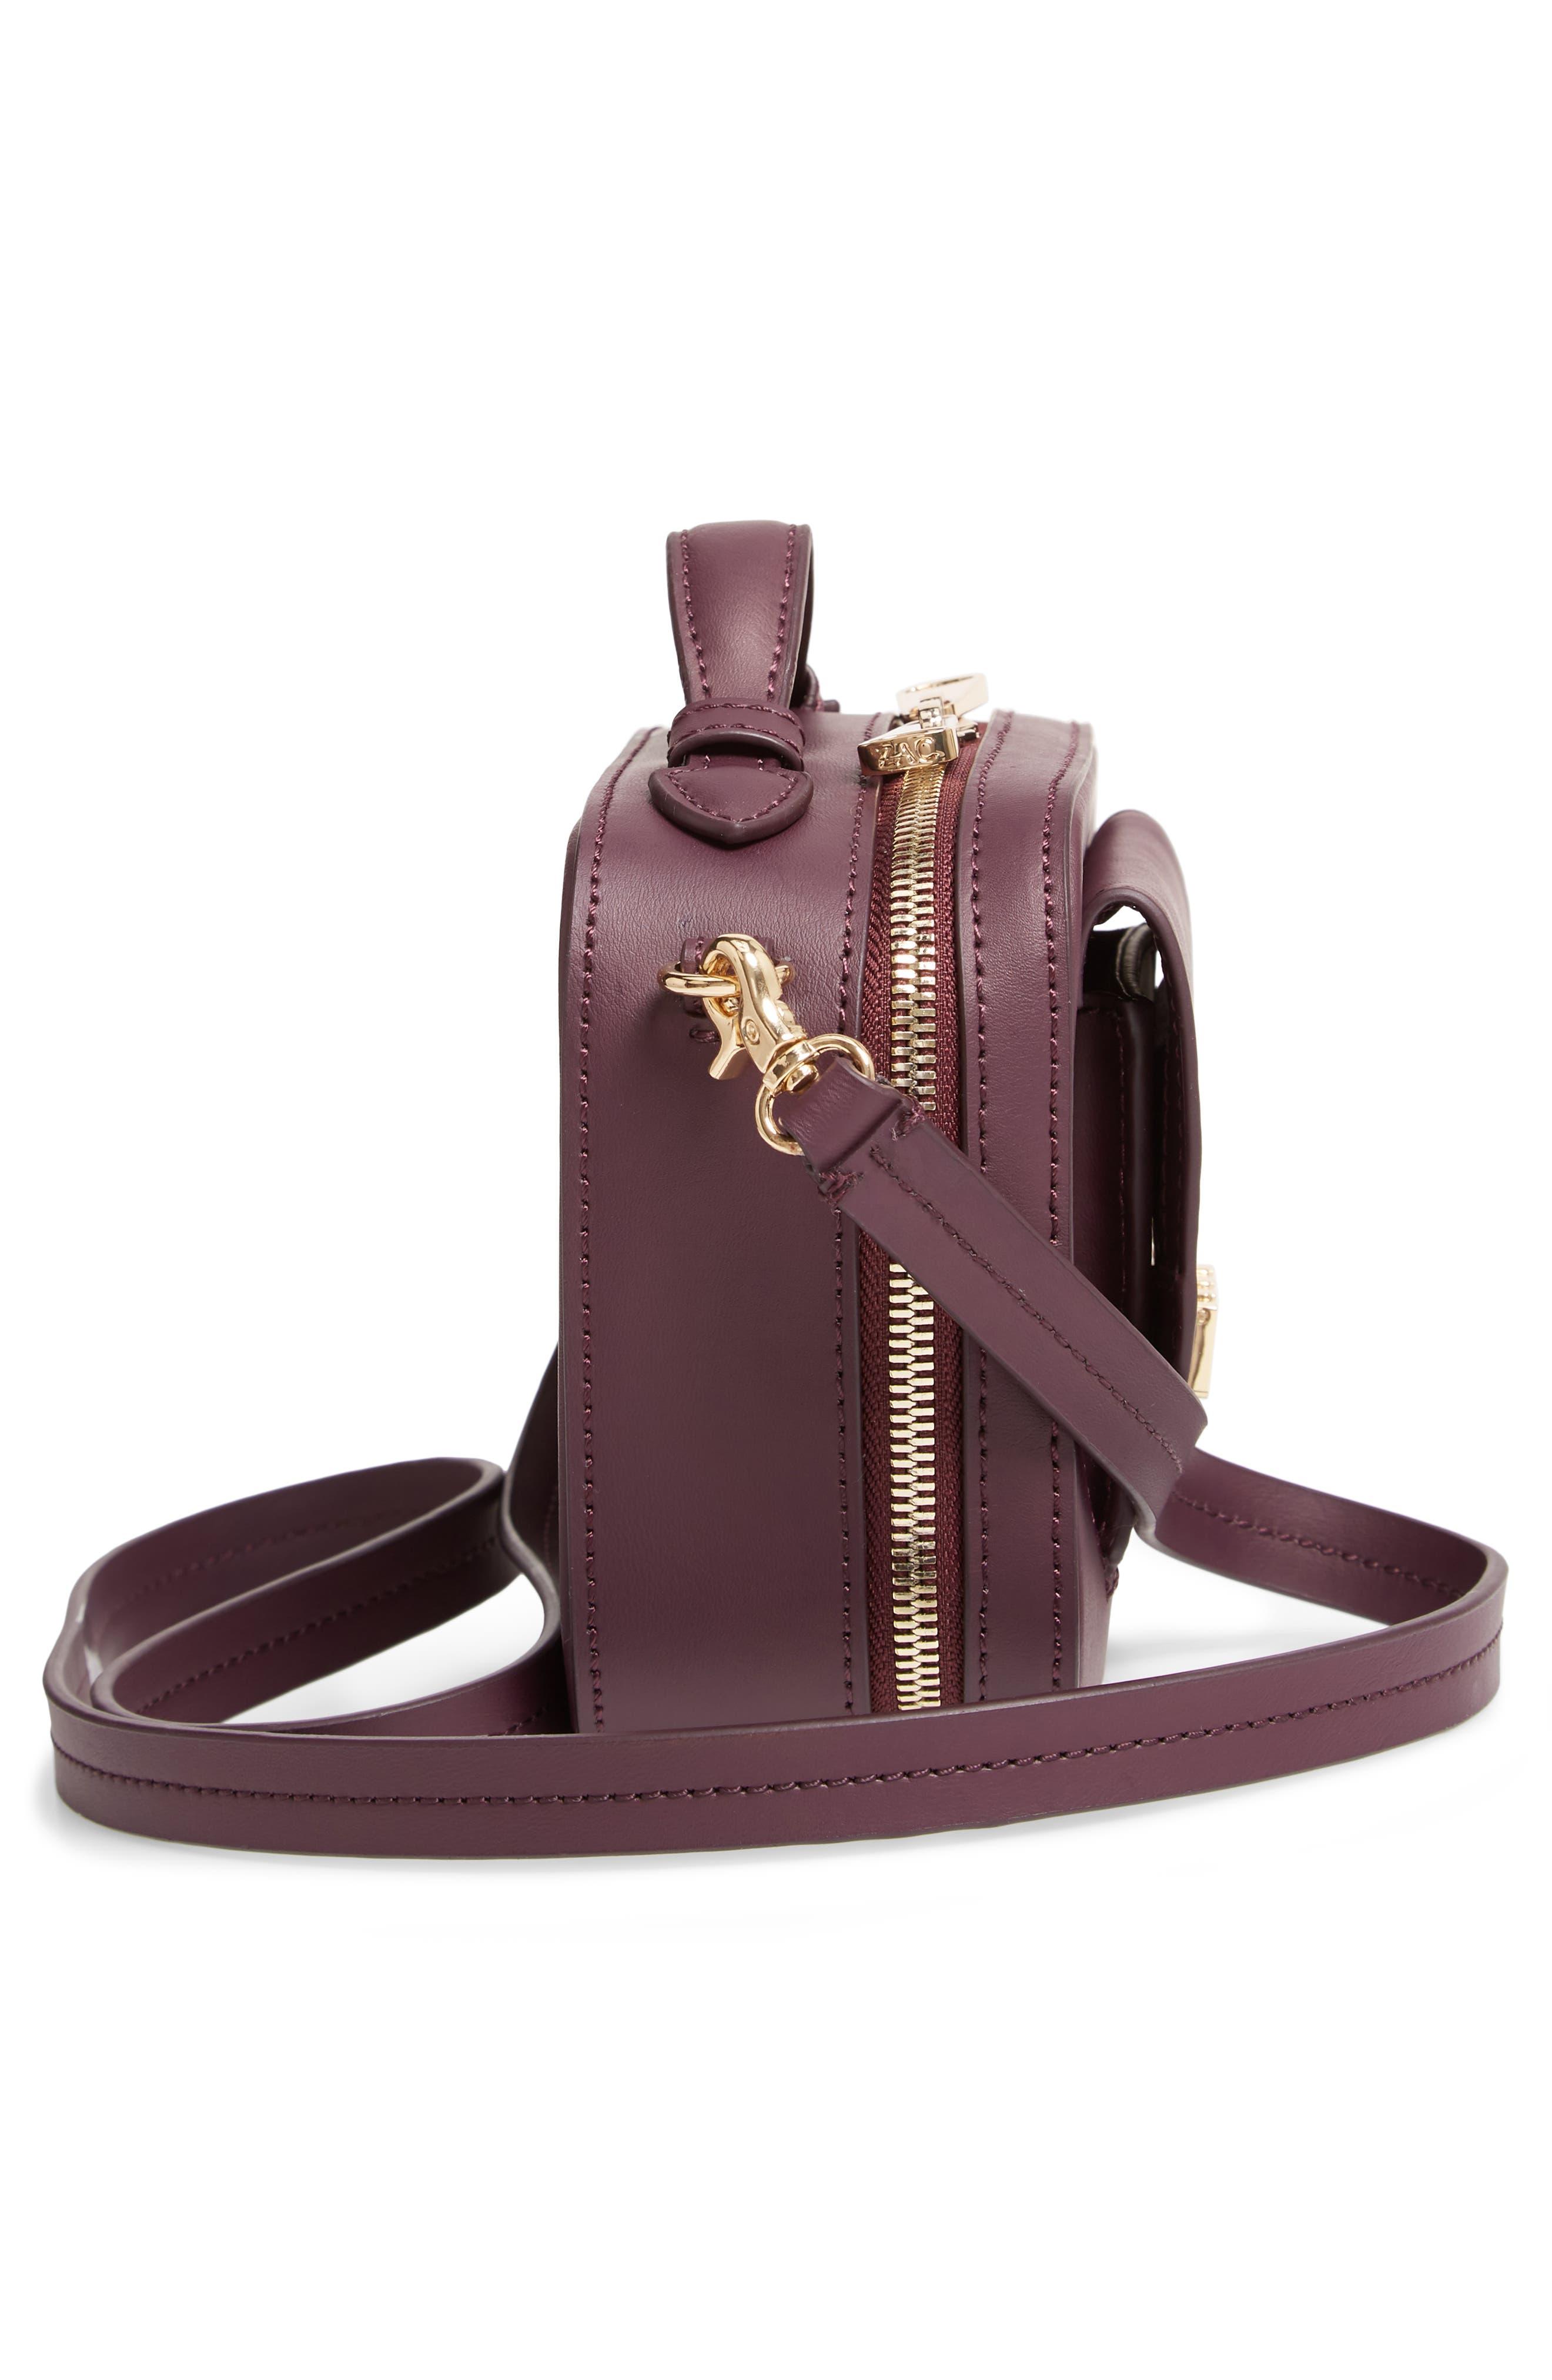 ZAC ZAC POSEN, Earthette Small Box Leather Crossbody Bag, Alternate thumbnail 5, color, 501